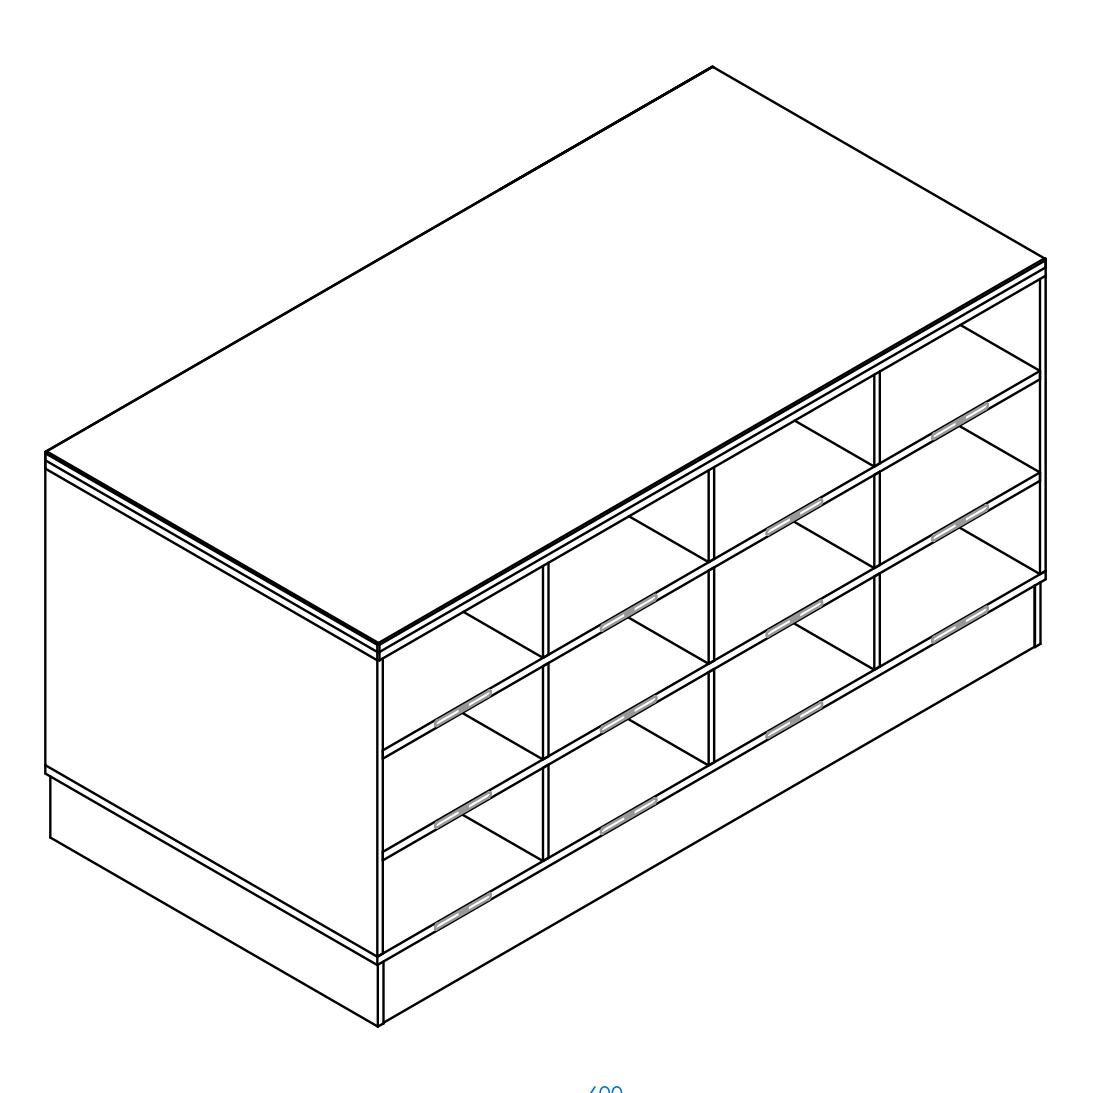 Sit-Over-Bank HPL mit beidseitigen Schuhfächern (3 Ebenen), ArtNr.: HPL_SOB_BS3R